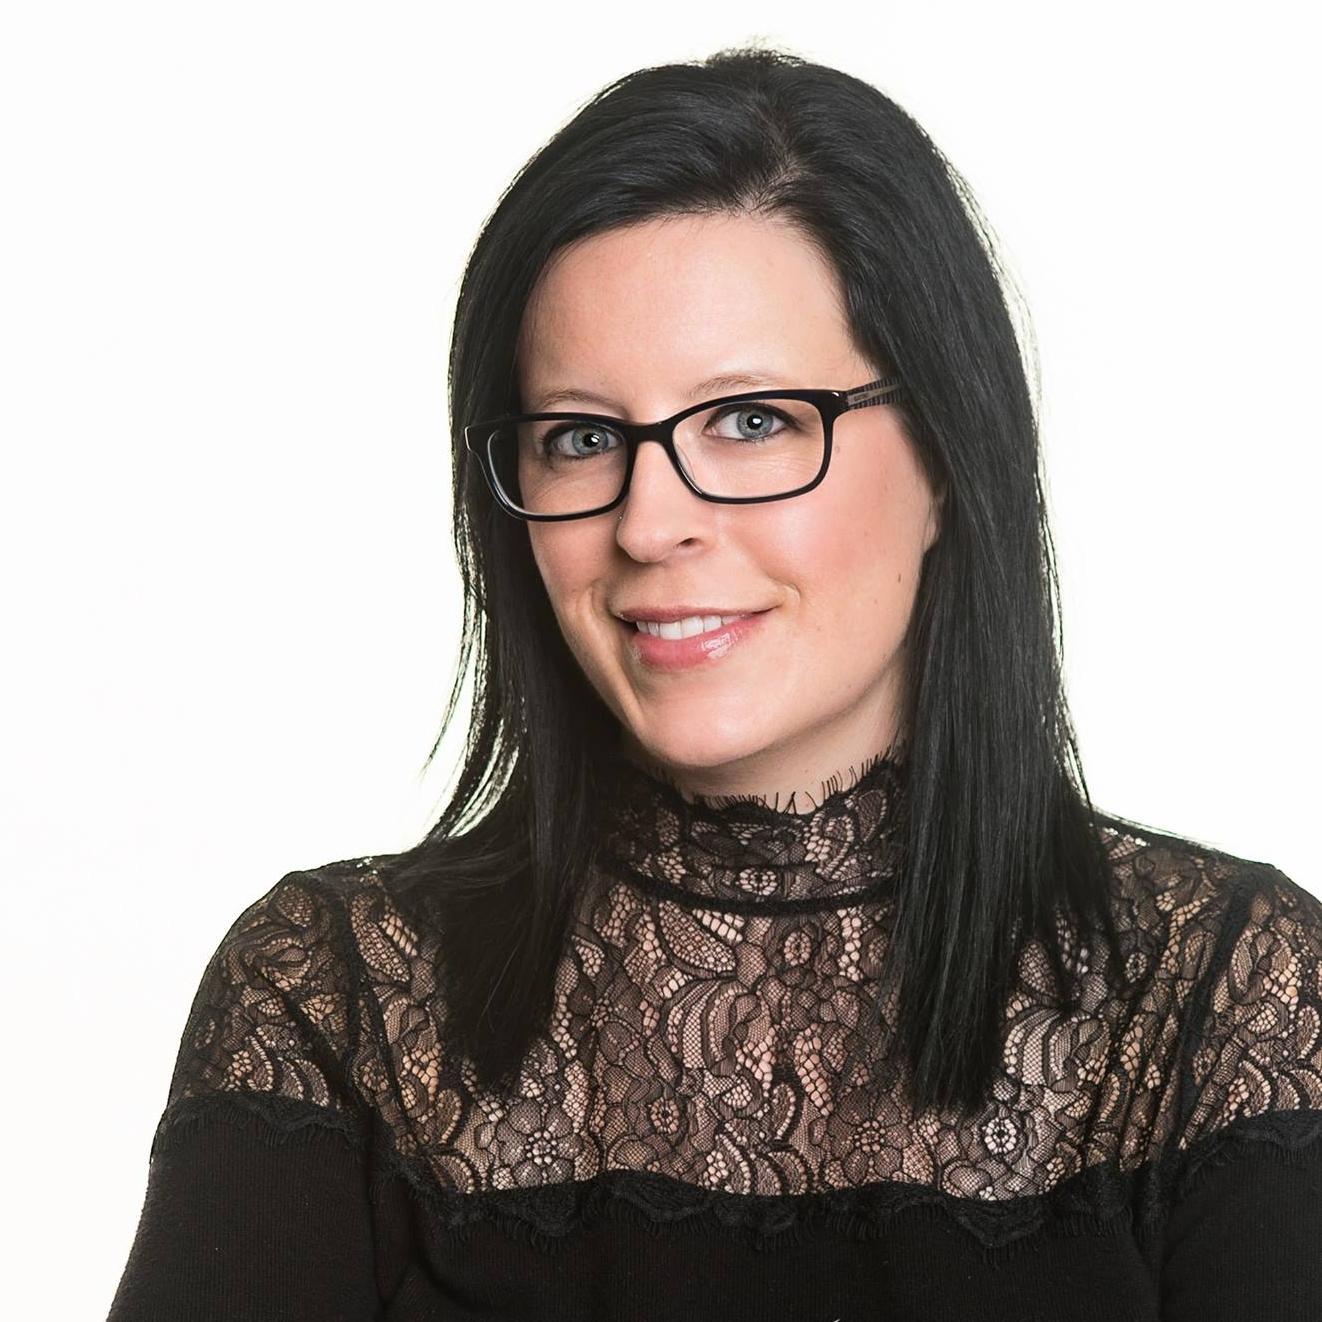 Headshot of Rebecca Bratz.